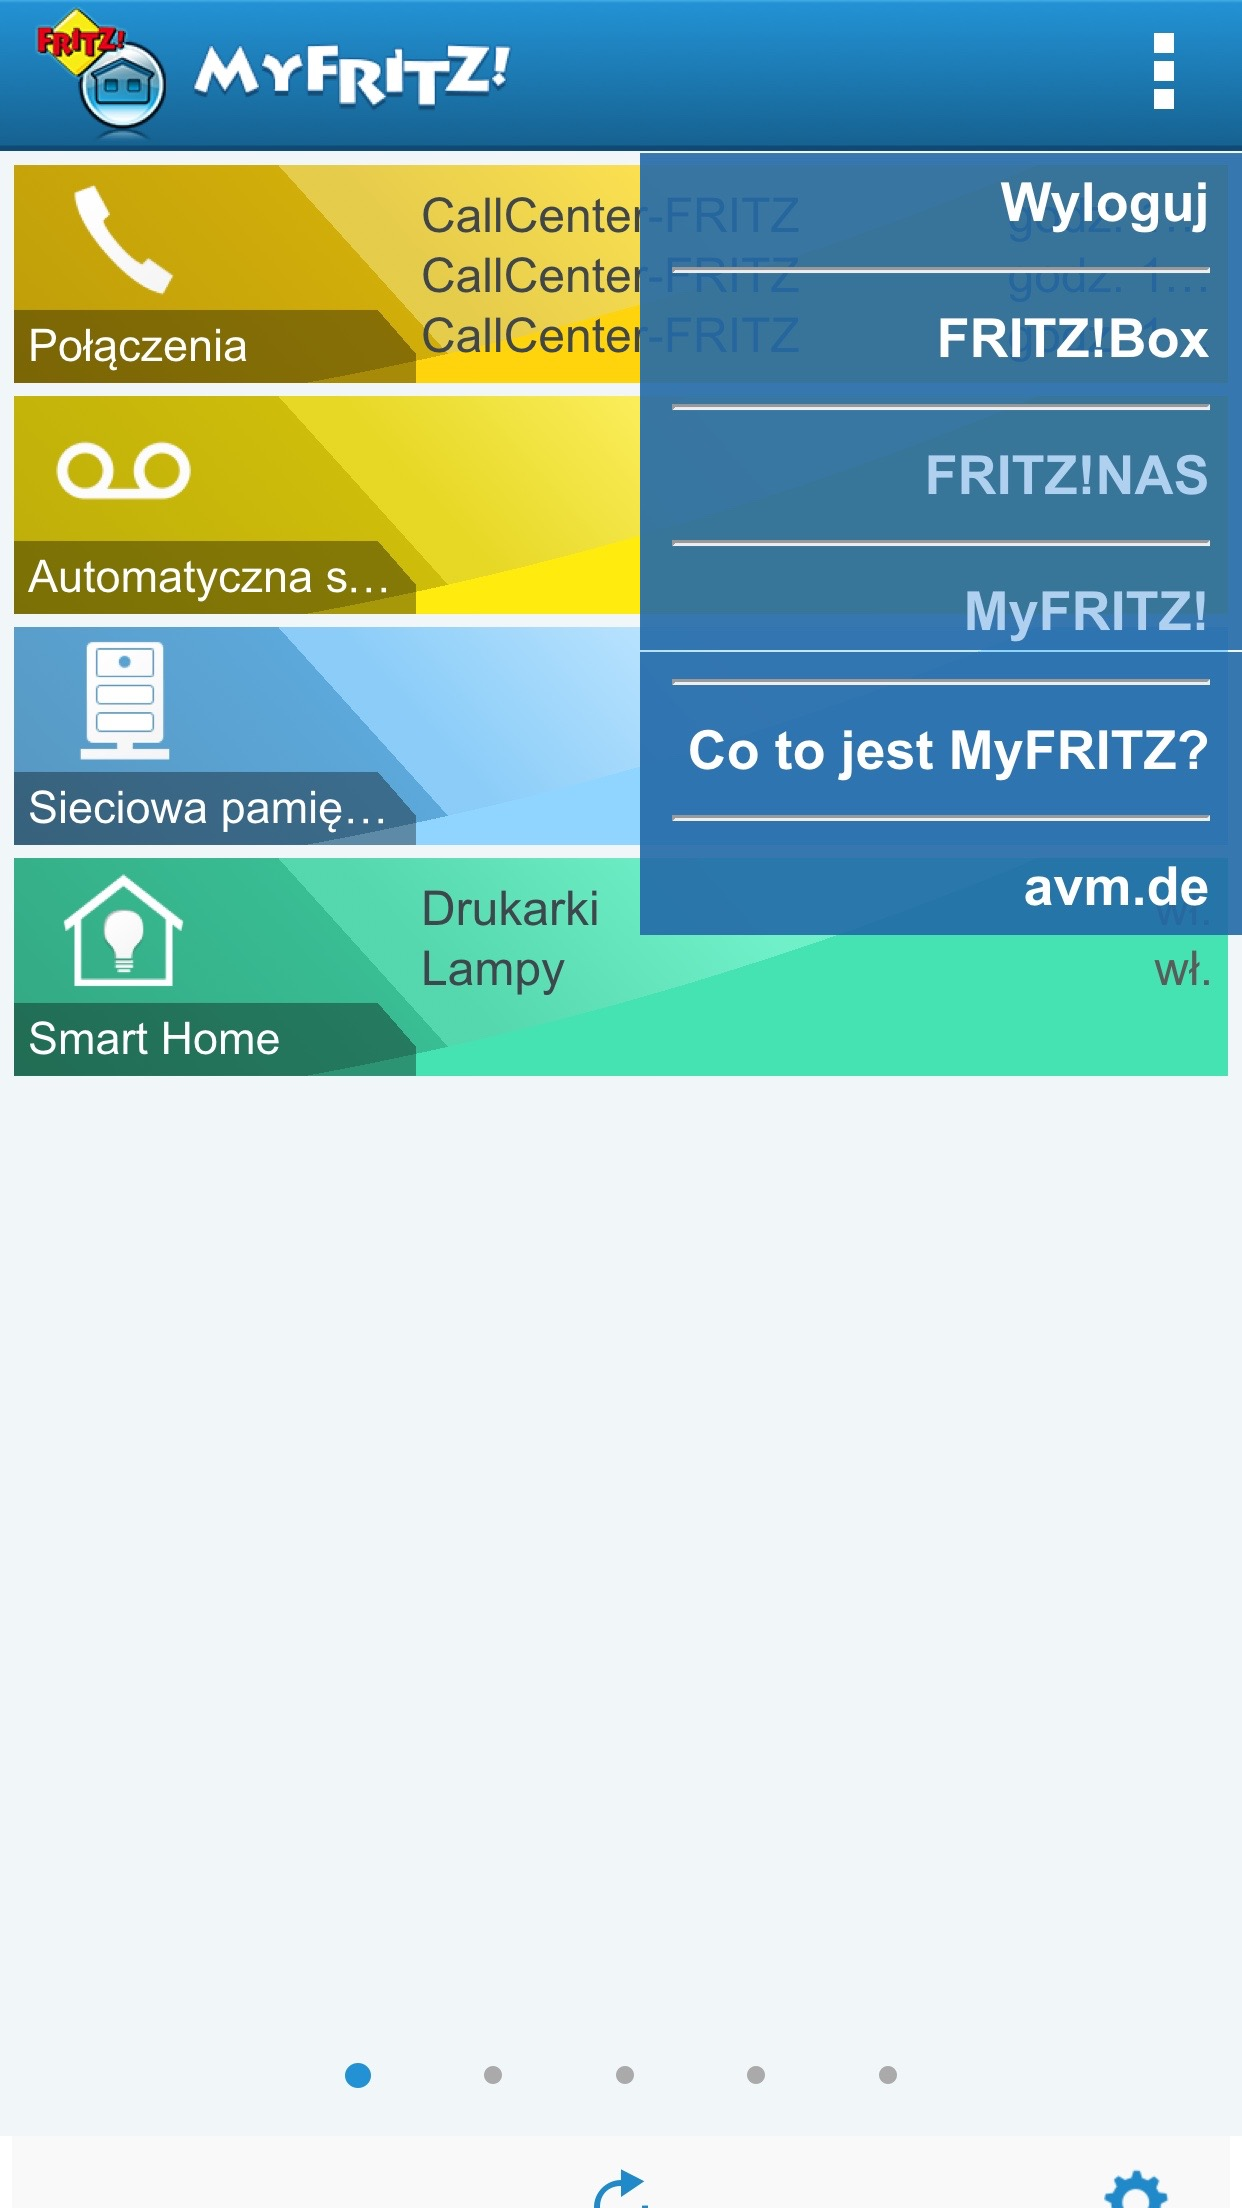 router fritz box 6840 lte i fritz dect 200 wra enia. Black Bedroom Furniture Sets. Home Design Ideas